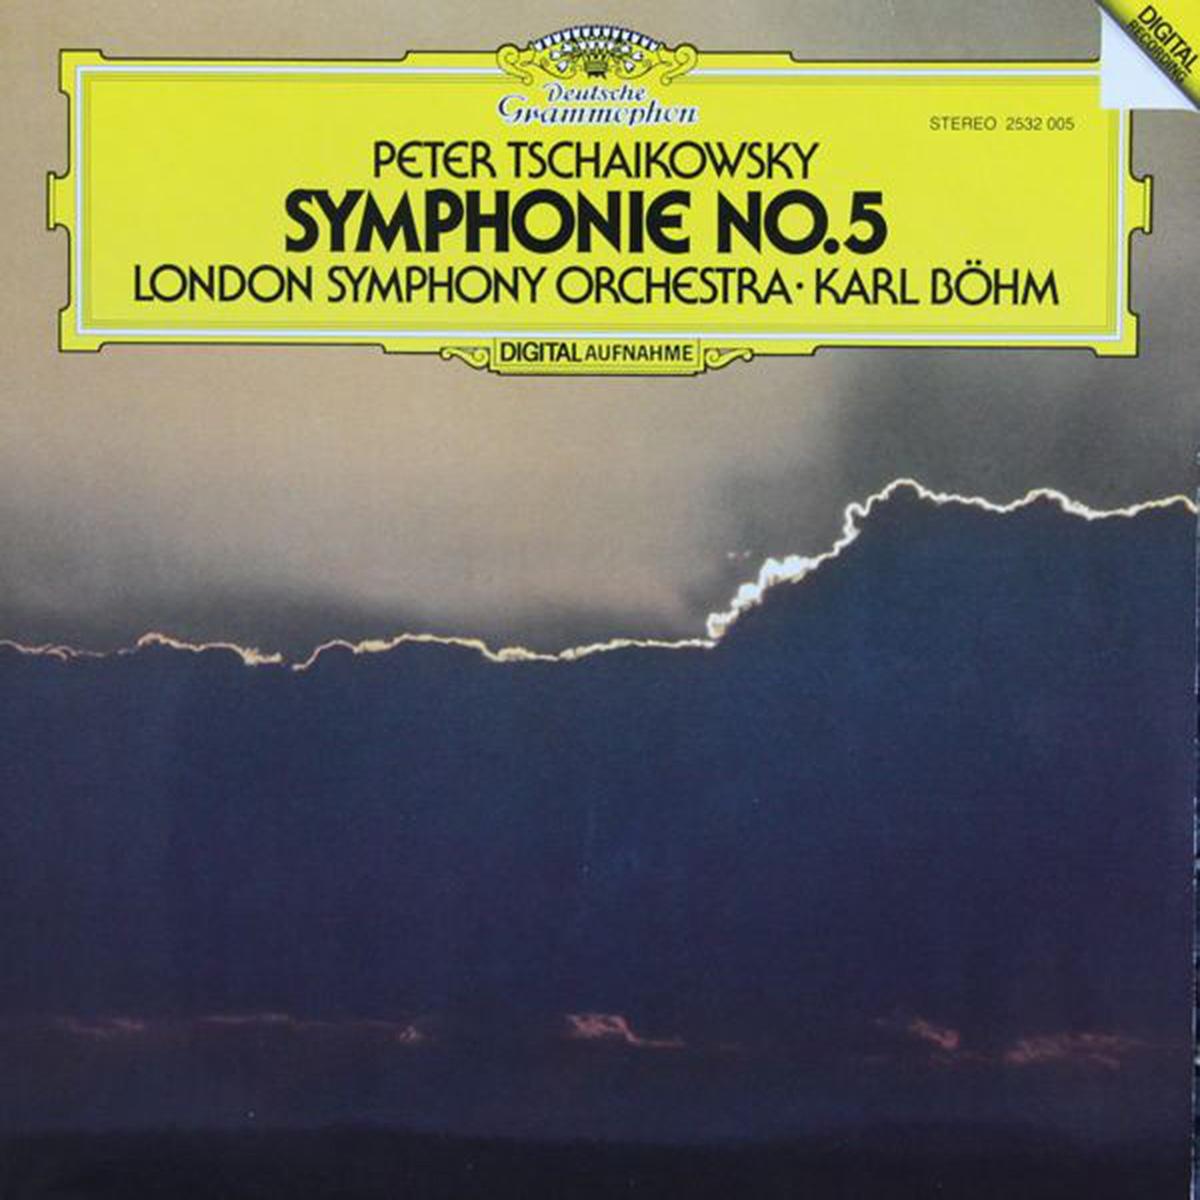 DGG 2532005_Tchaikowsky Symphonie 5 Bohm